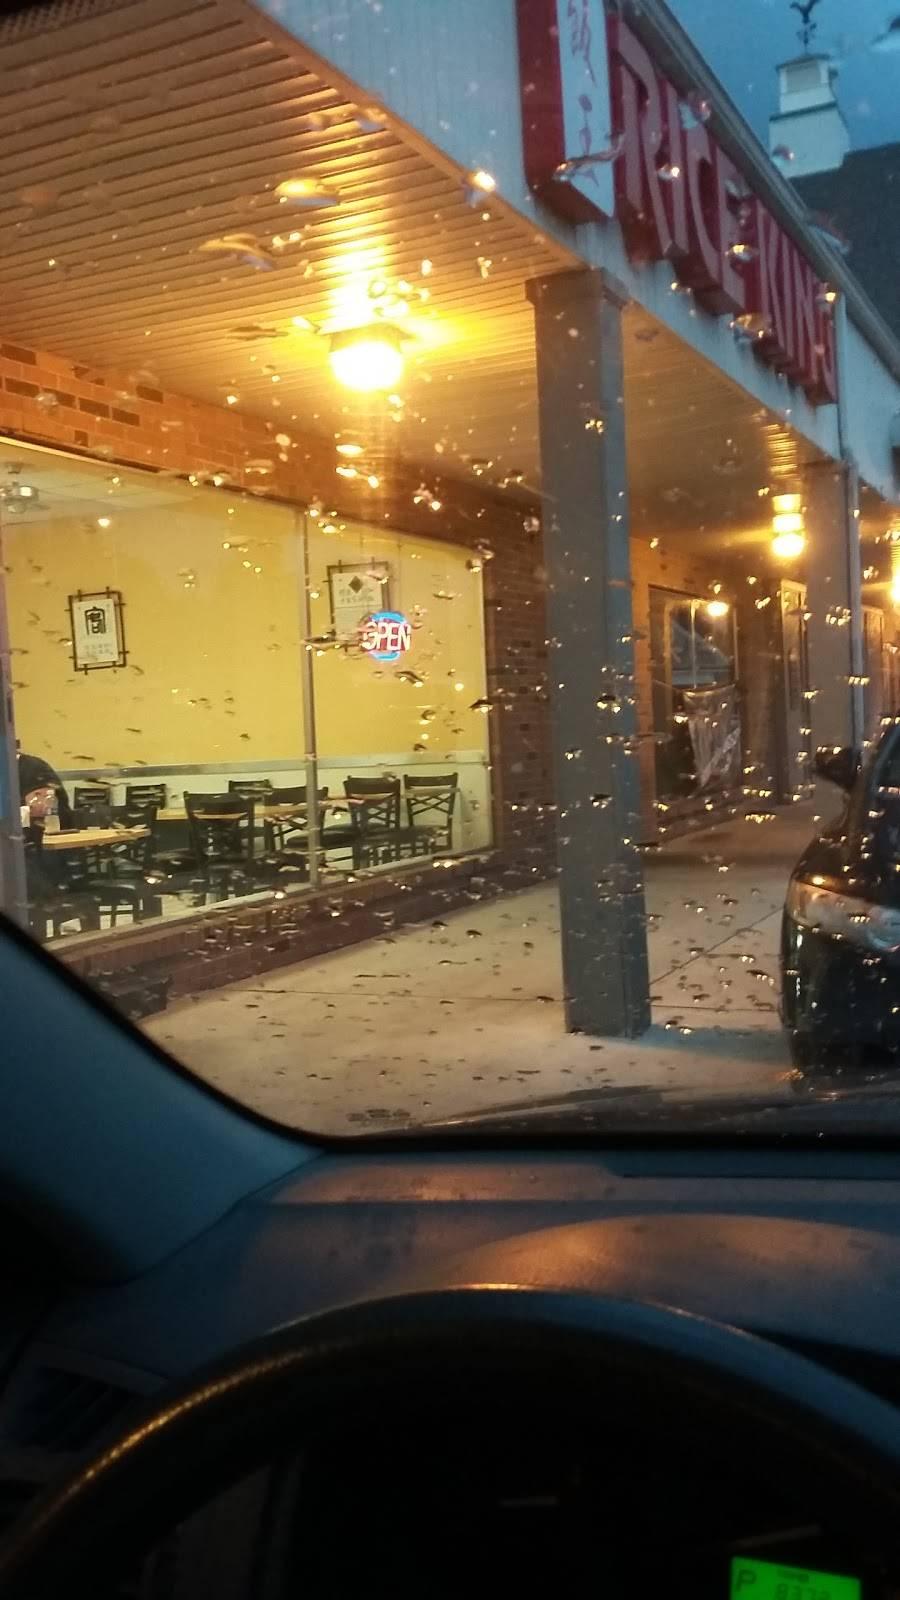 Rice King - restaurant  | Photo 4 of 4 | Address: 4400 Heatherdowns Blvd, Toledo, OH 43614, USA | Phone: (419) 381-8028